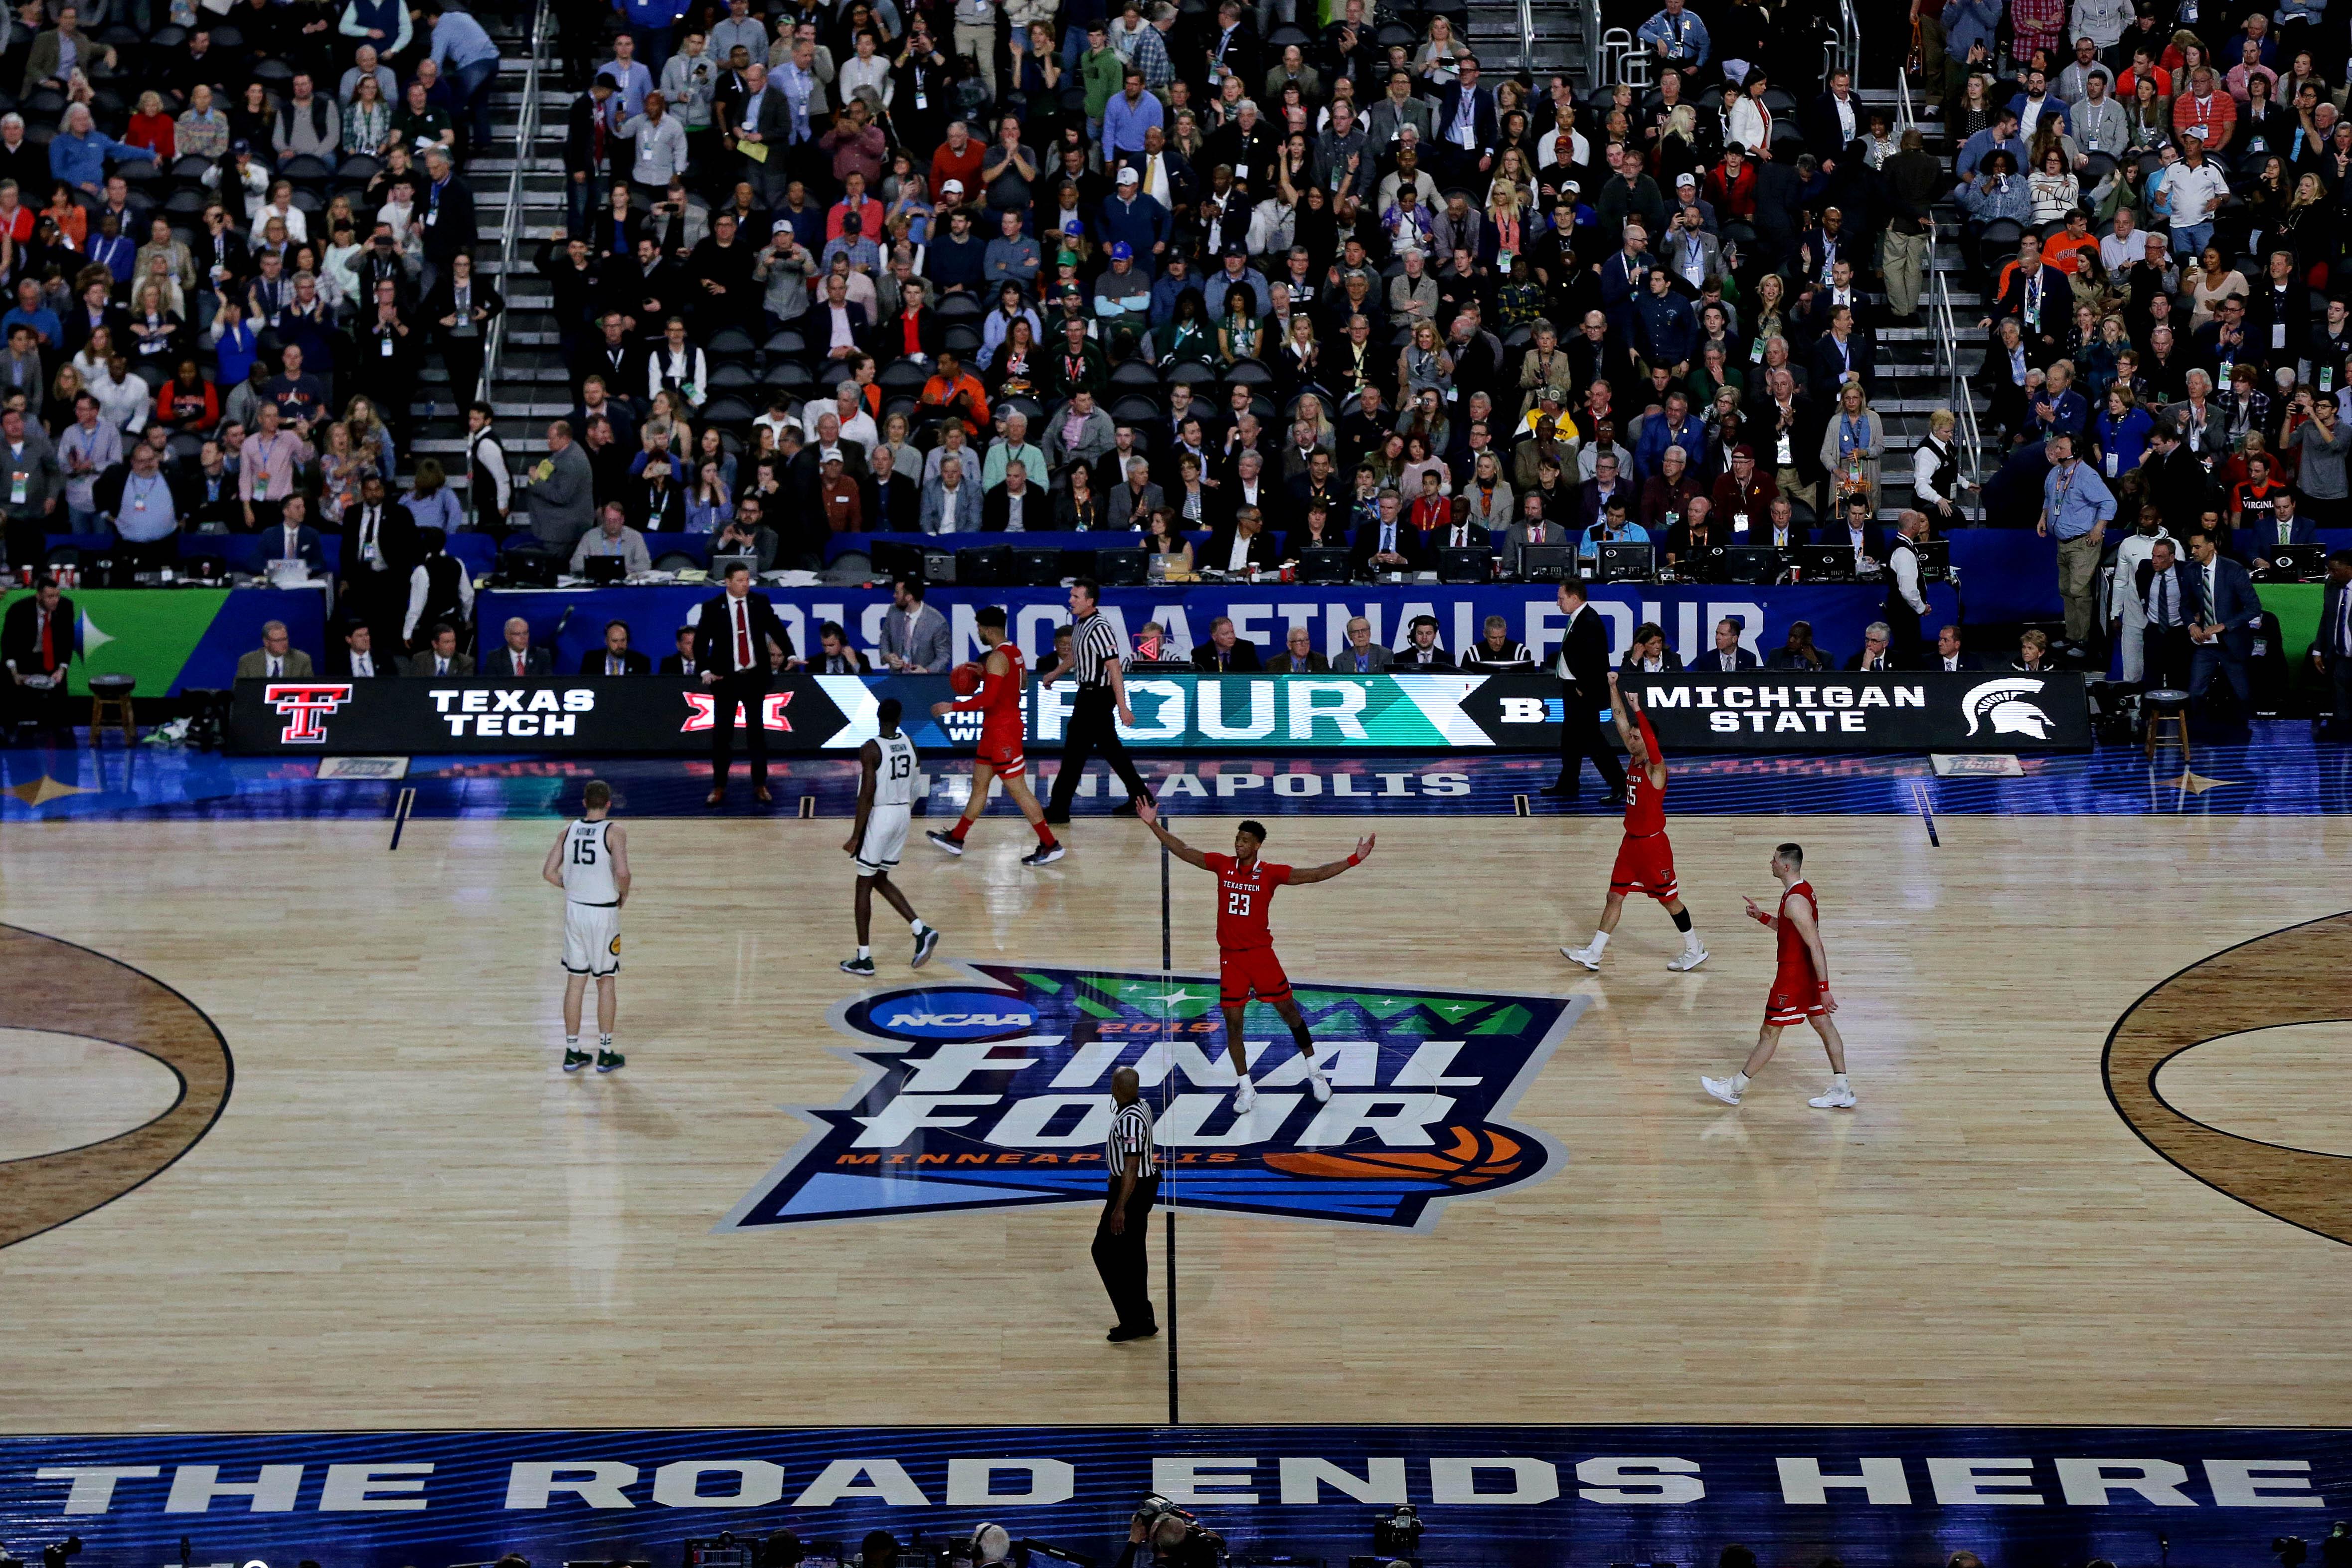 Minneapolis Sees High Attendance Figure For Final Four